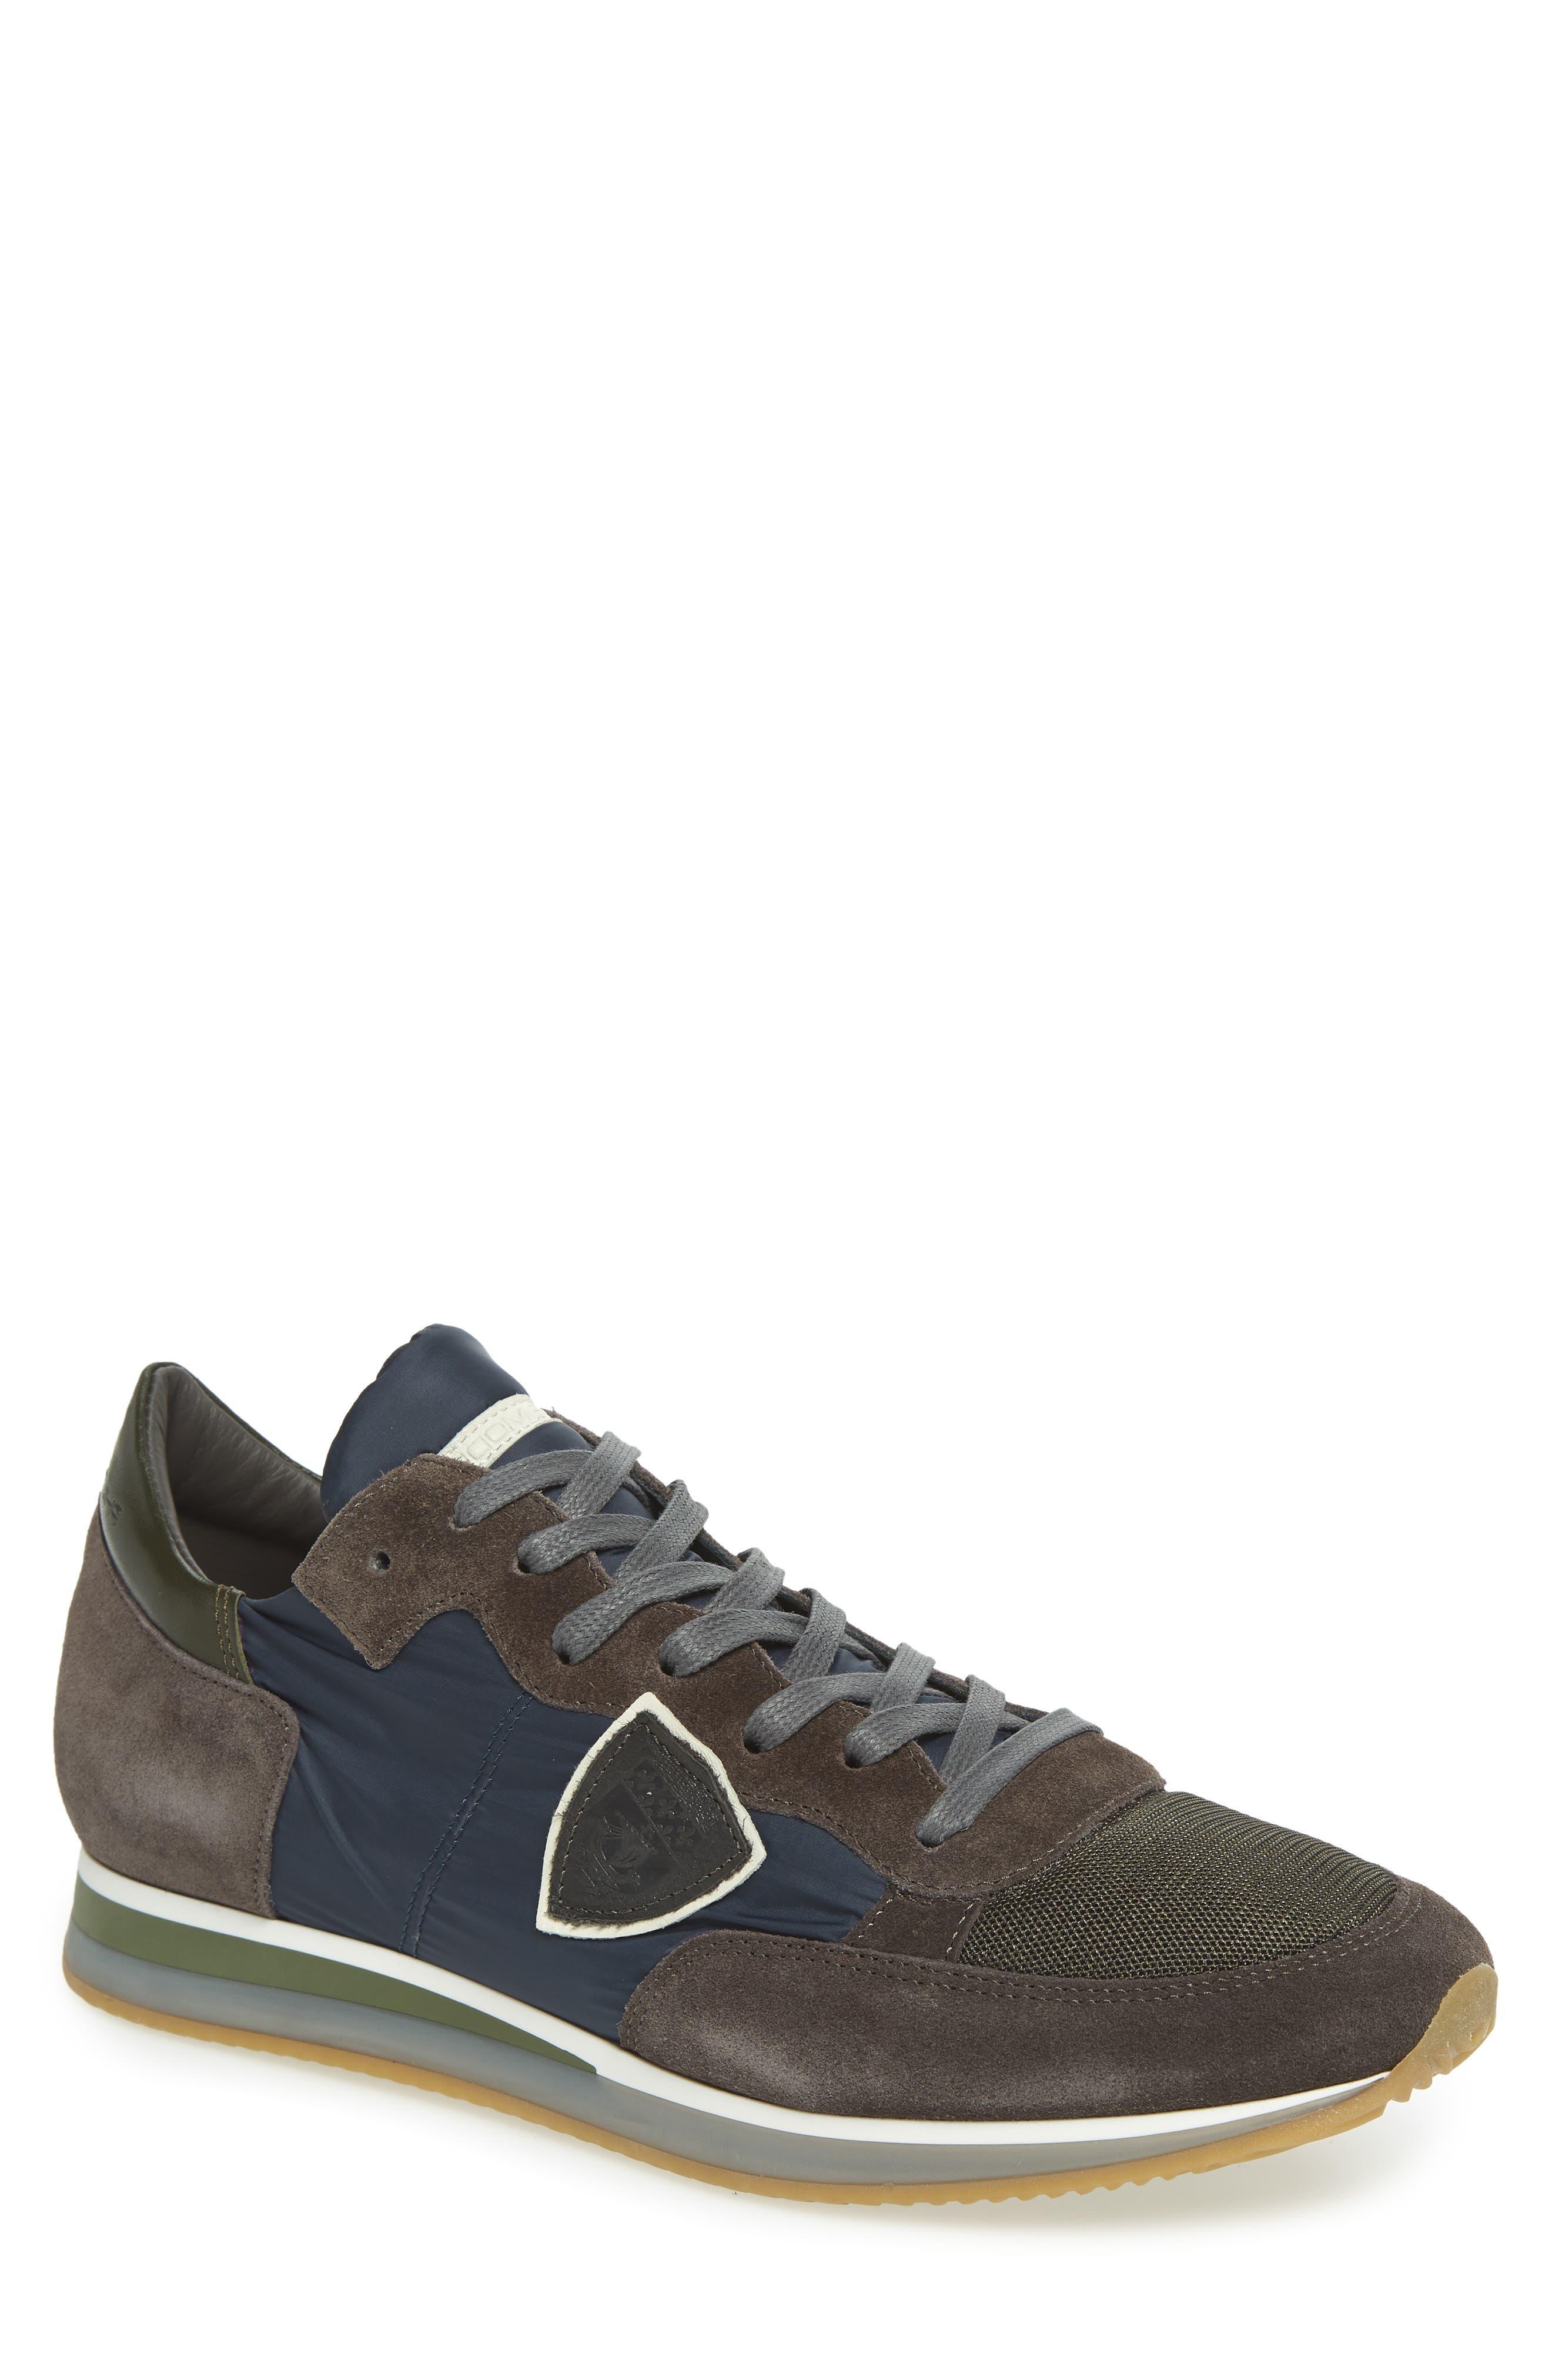 Tropez Low Top Sneaker,                             Main thumbnail 1, color,                             BLUE/ GREY